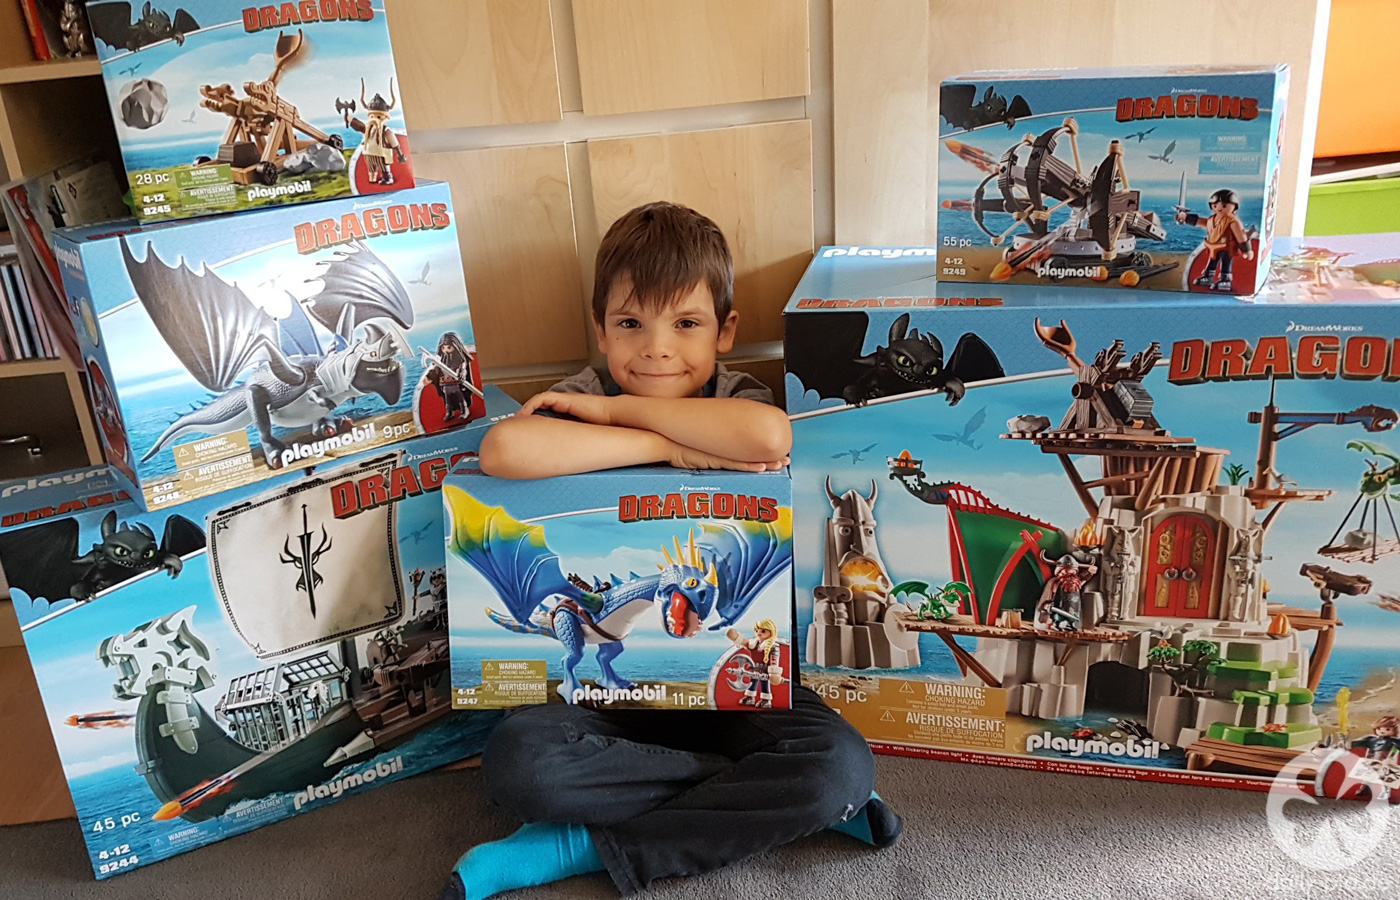 Max und die Playmobil Dragons